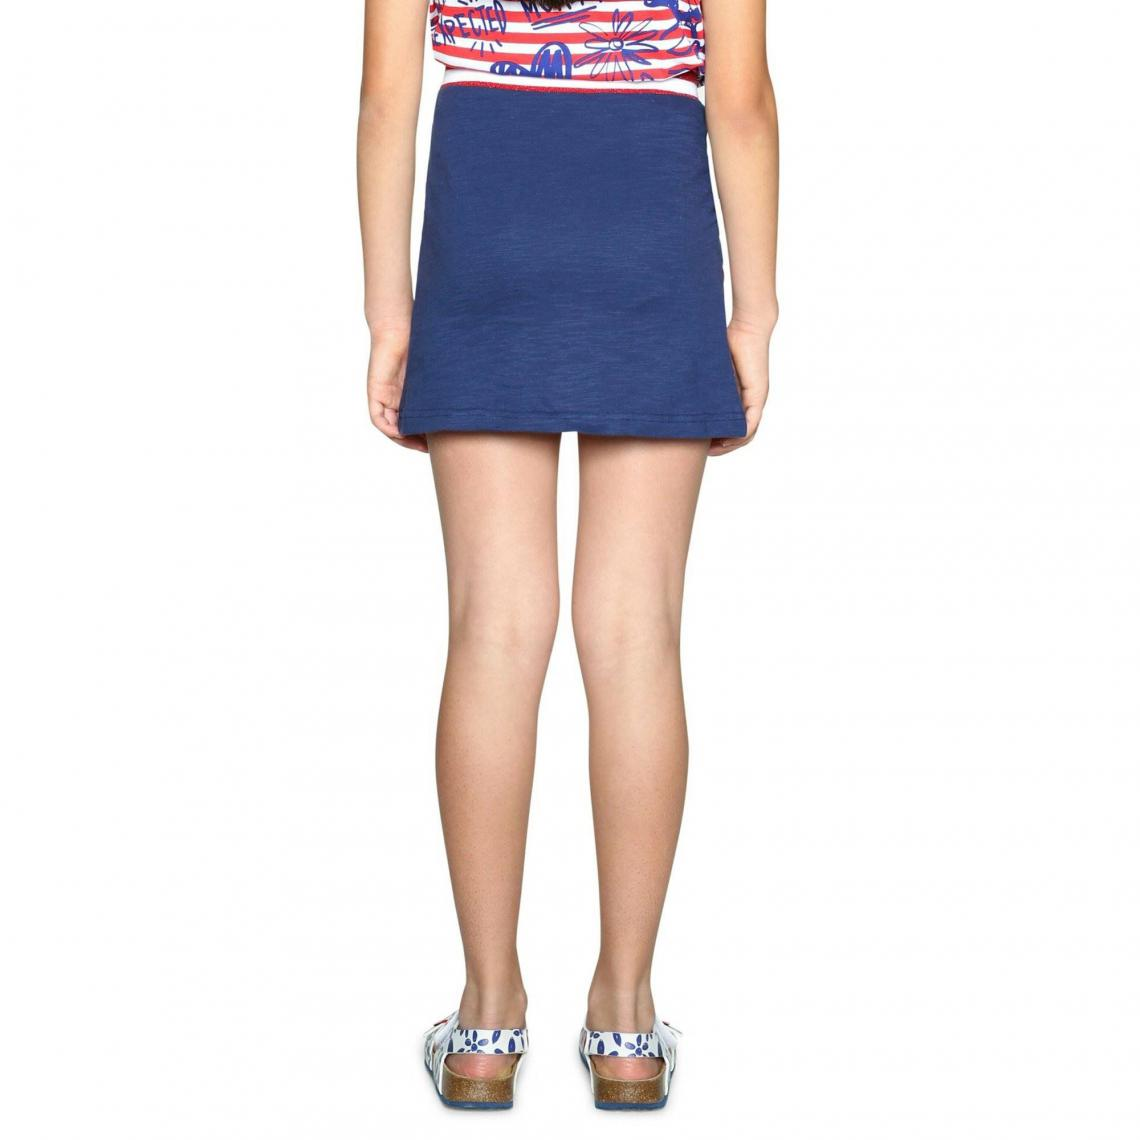 Jupe courte sequins fille Desigual - Bleu Marine   3Suisses e5584877ee15